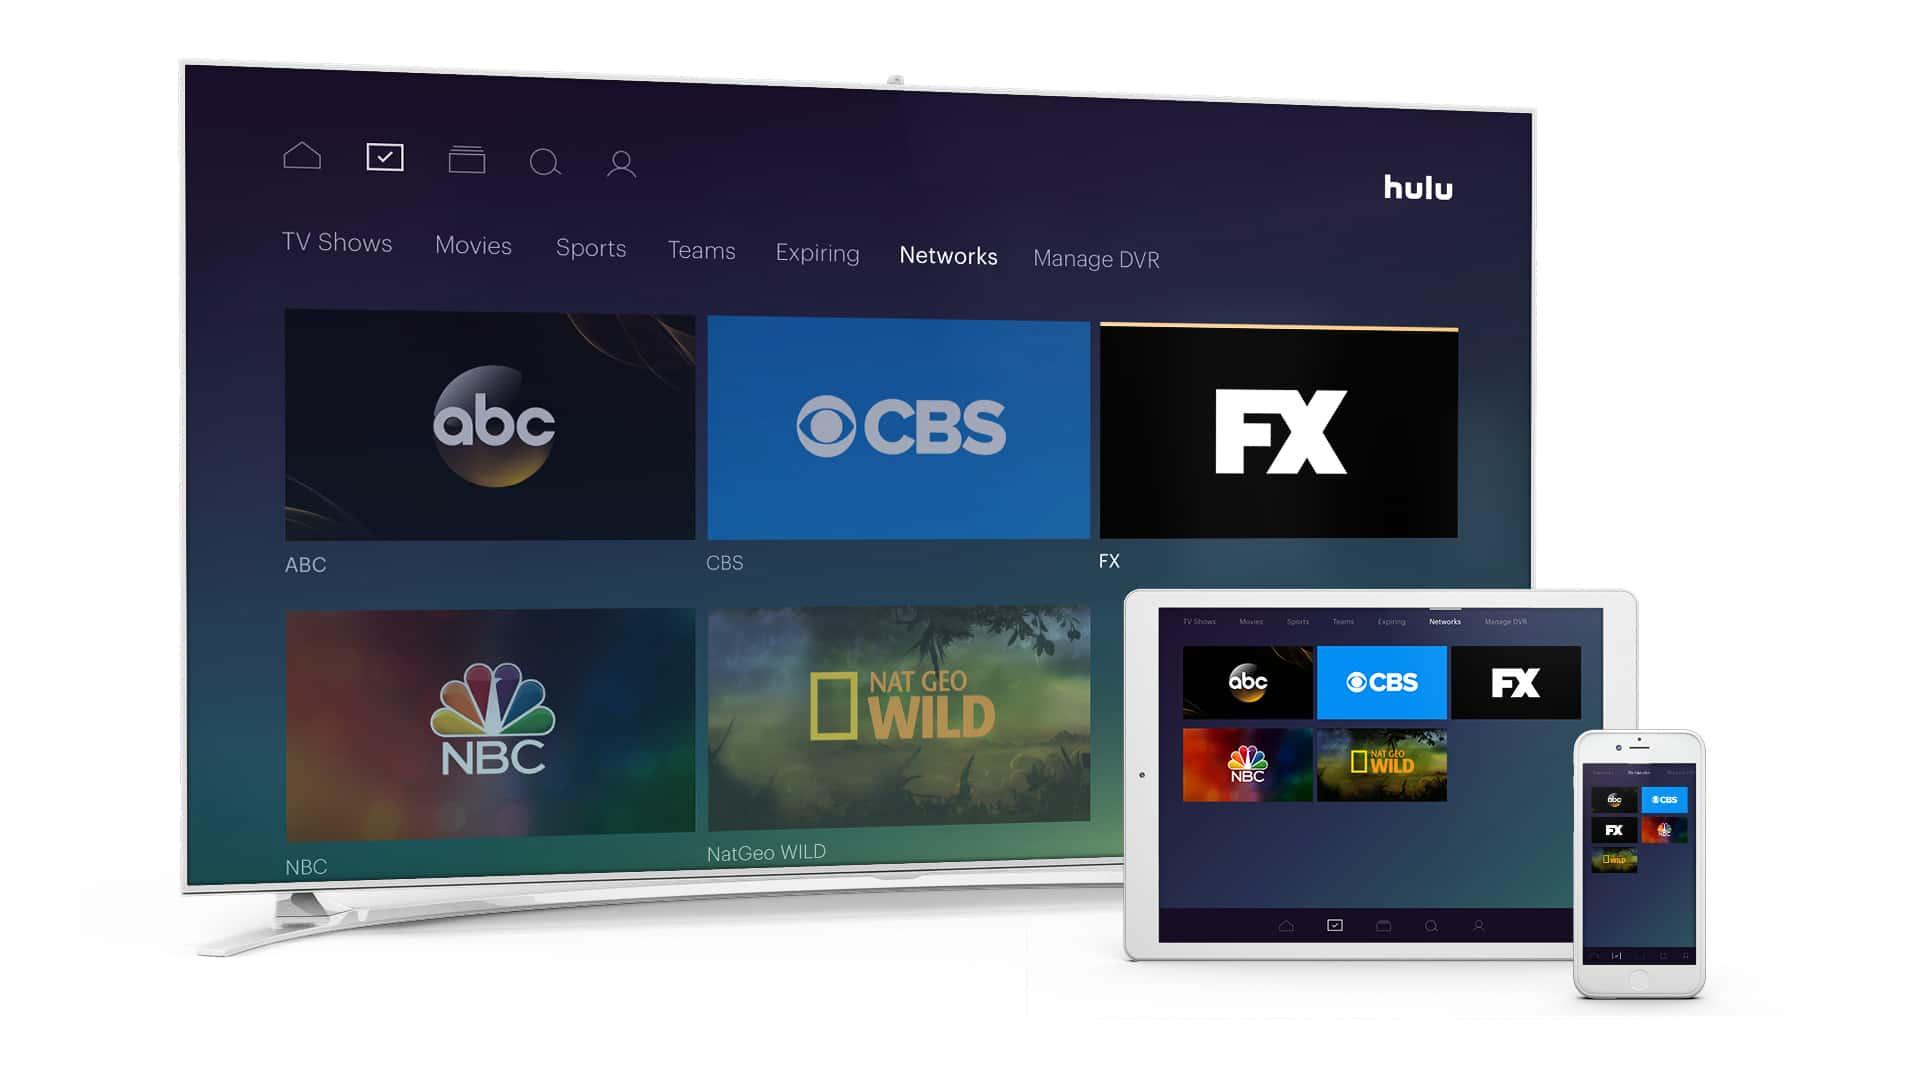 Hulu Live TV Major Networks